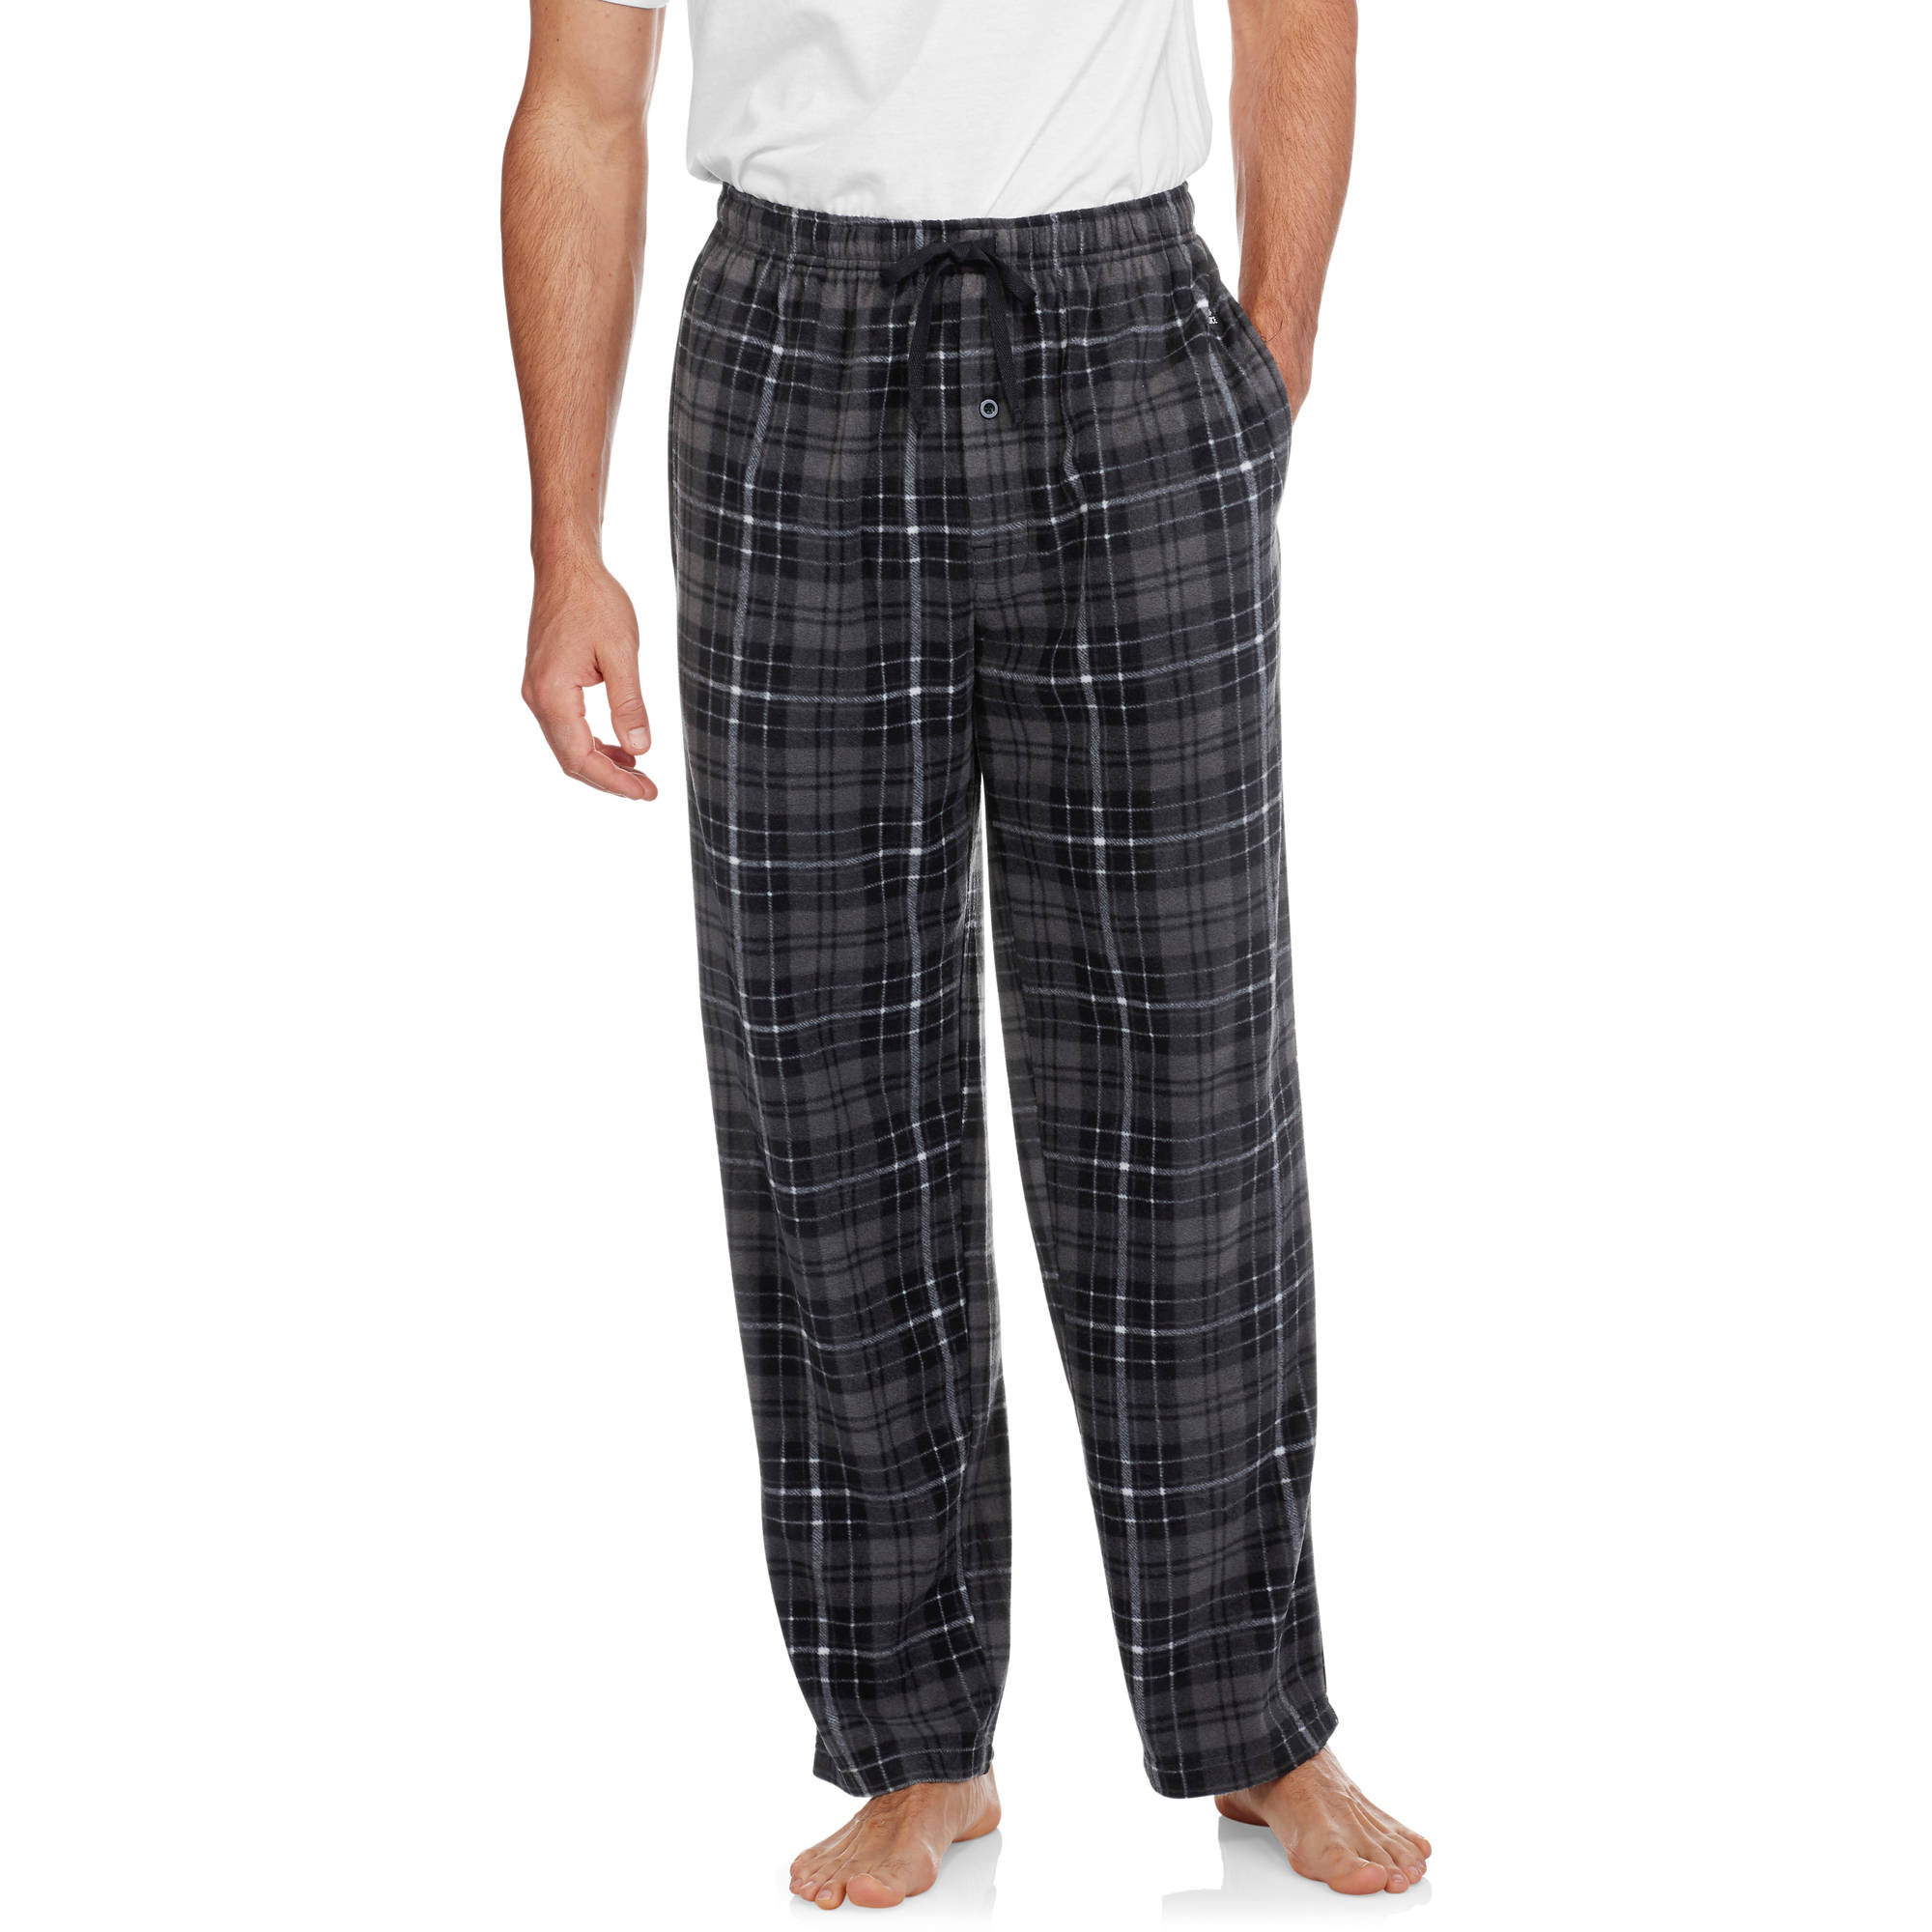 Heat Force Big Men's Microfleece Sleep Pants, 2XL